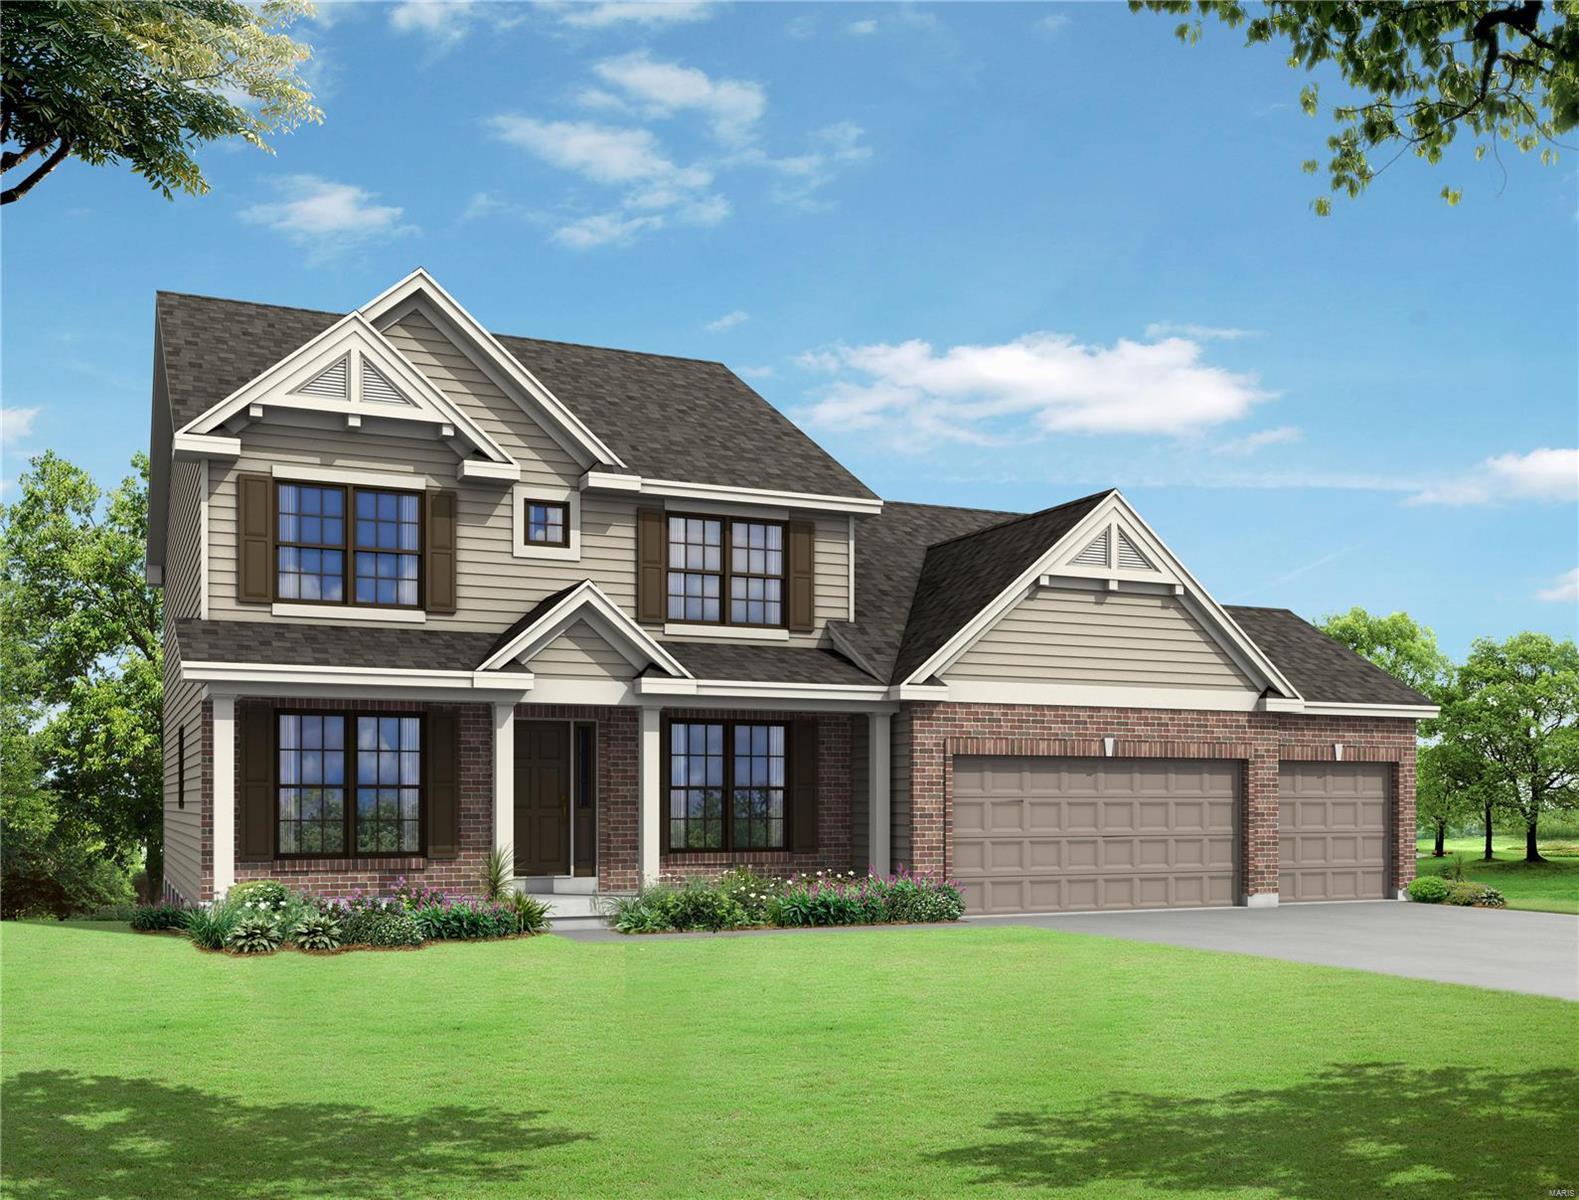 2 Arbors / Liberty Model Property Photo - Eureka, MO real estate listing